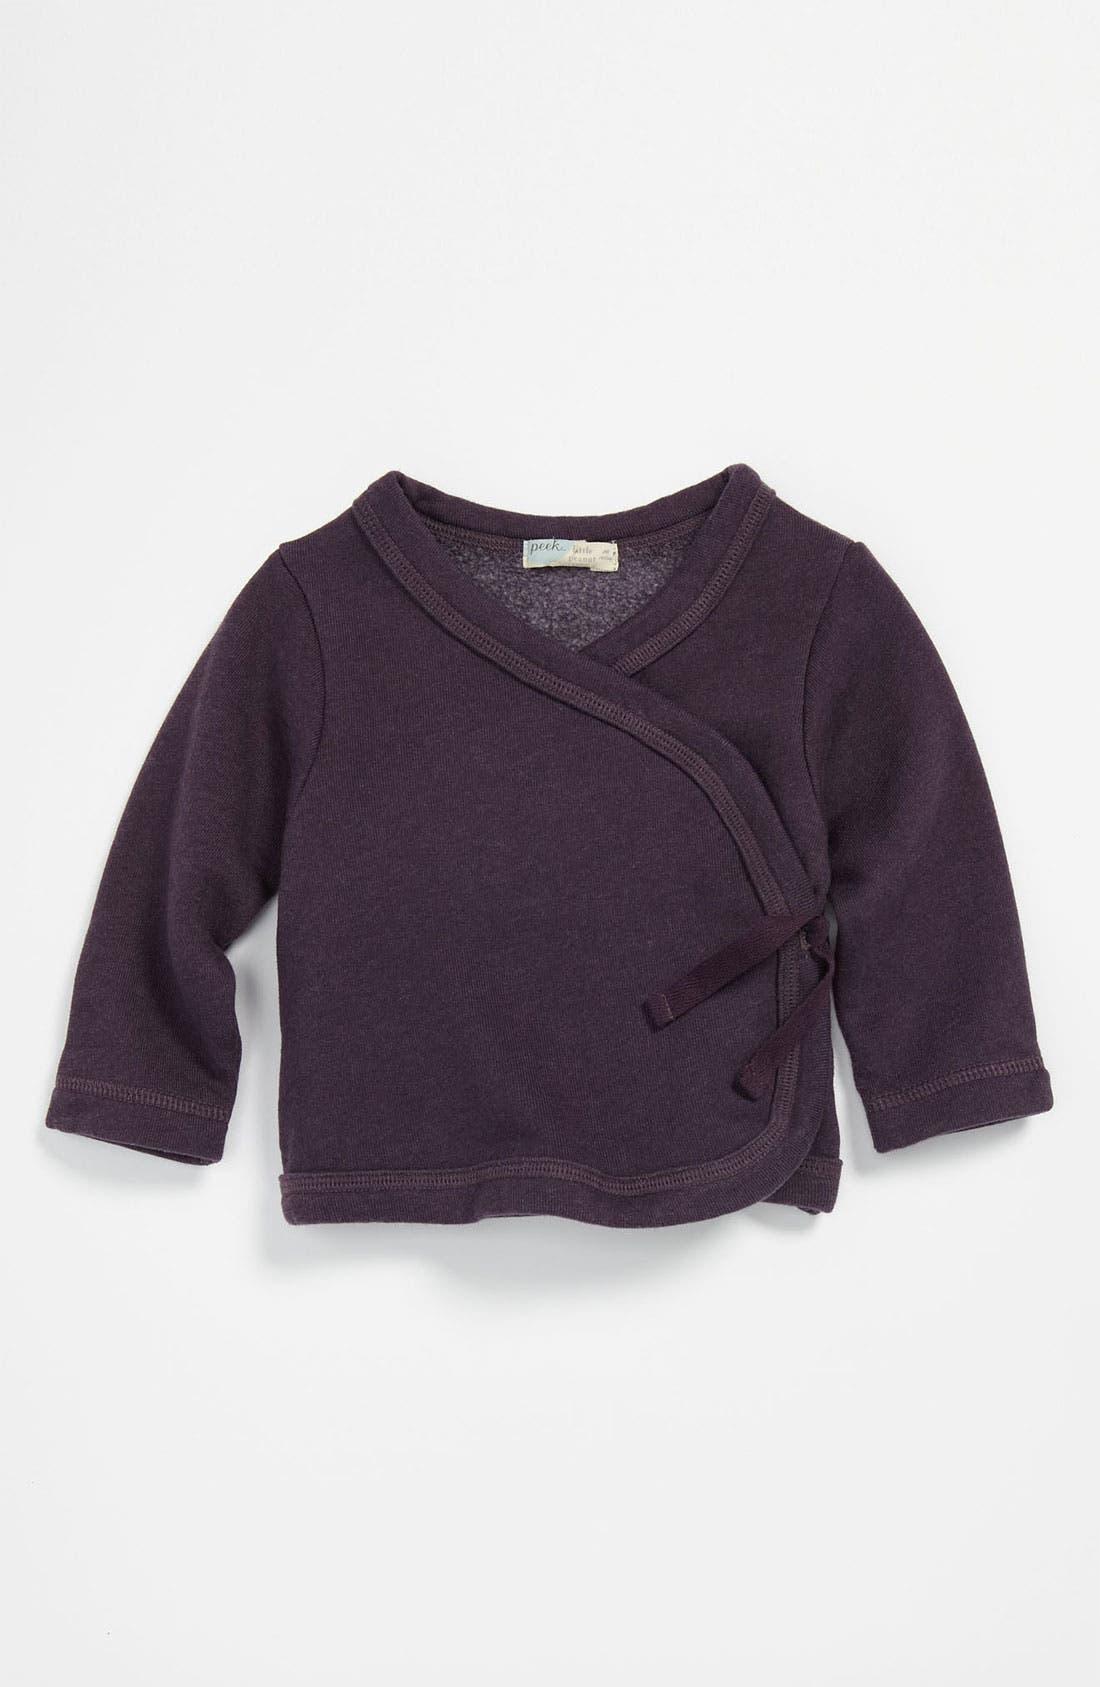 Main Image - Peek 'Cozy' Wrap Sweater (Infant)